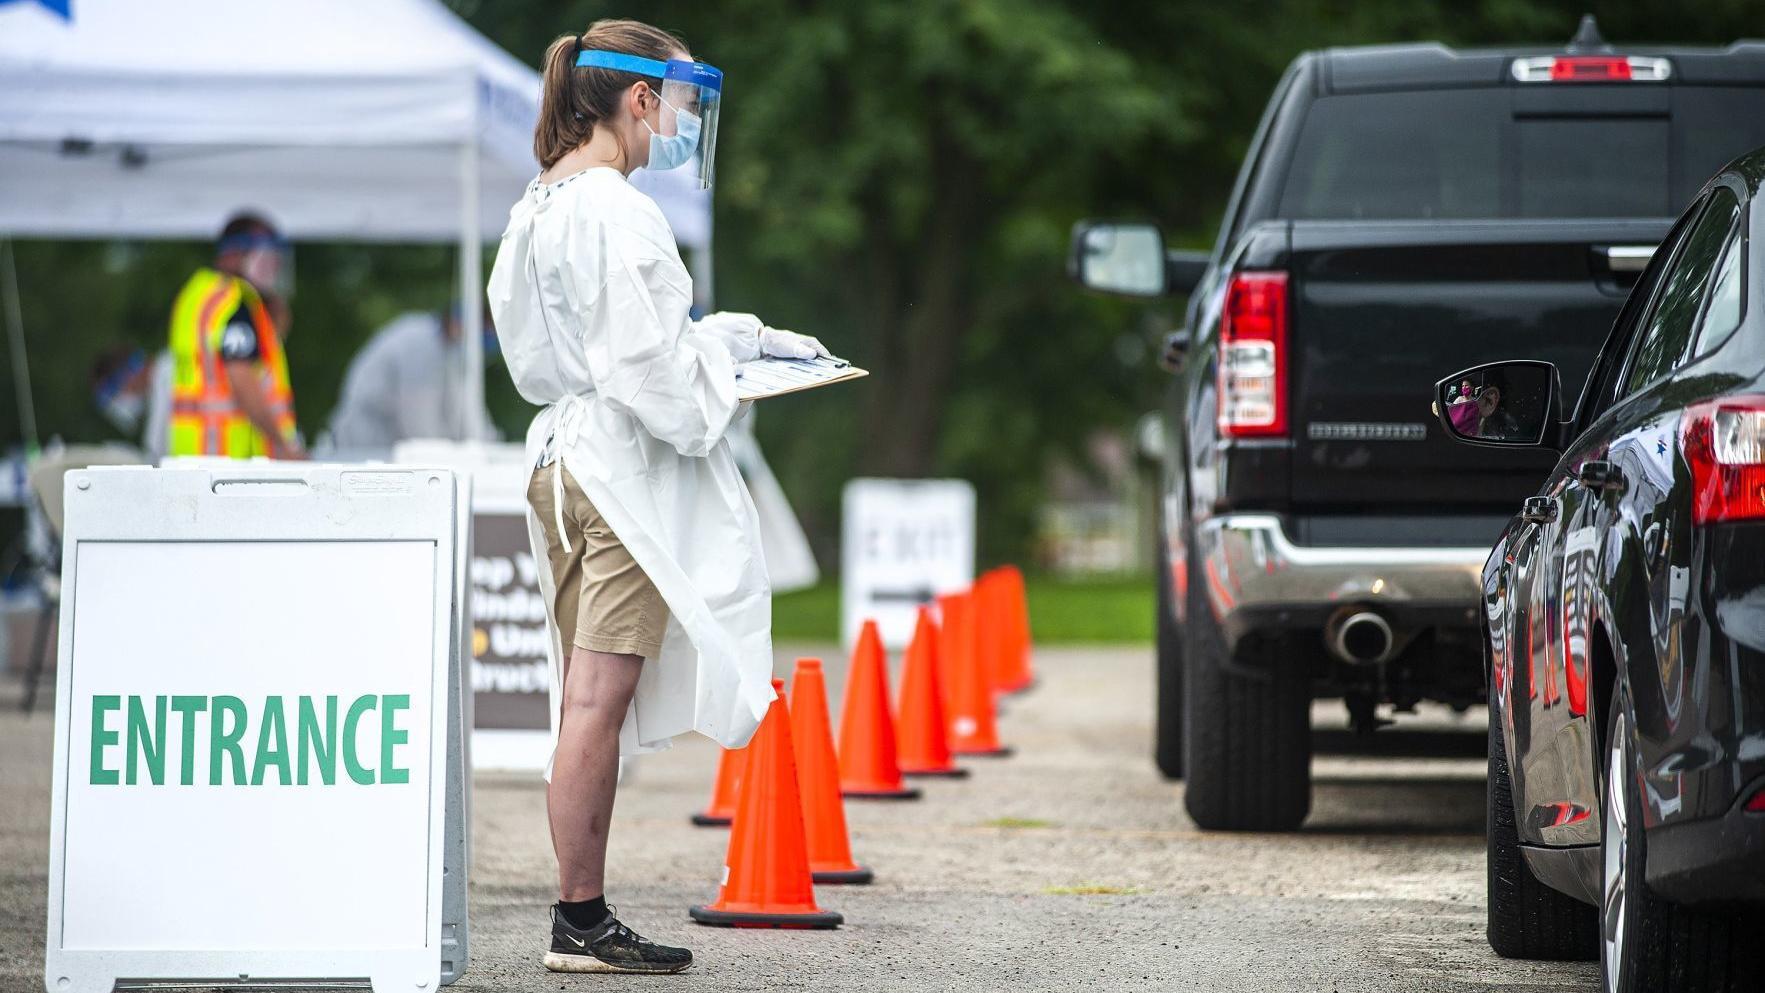 McLean County Health Department: Remain vigilant, despite 'COVID fatigue'